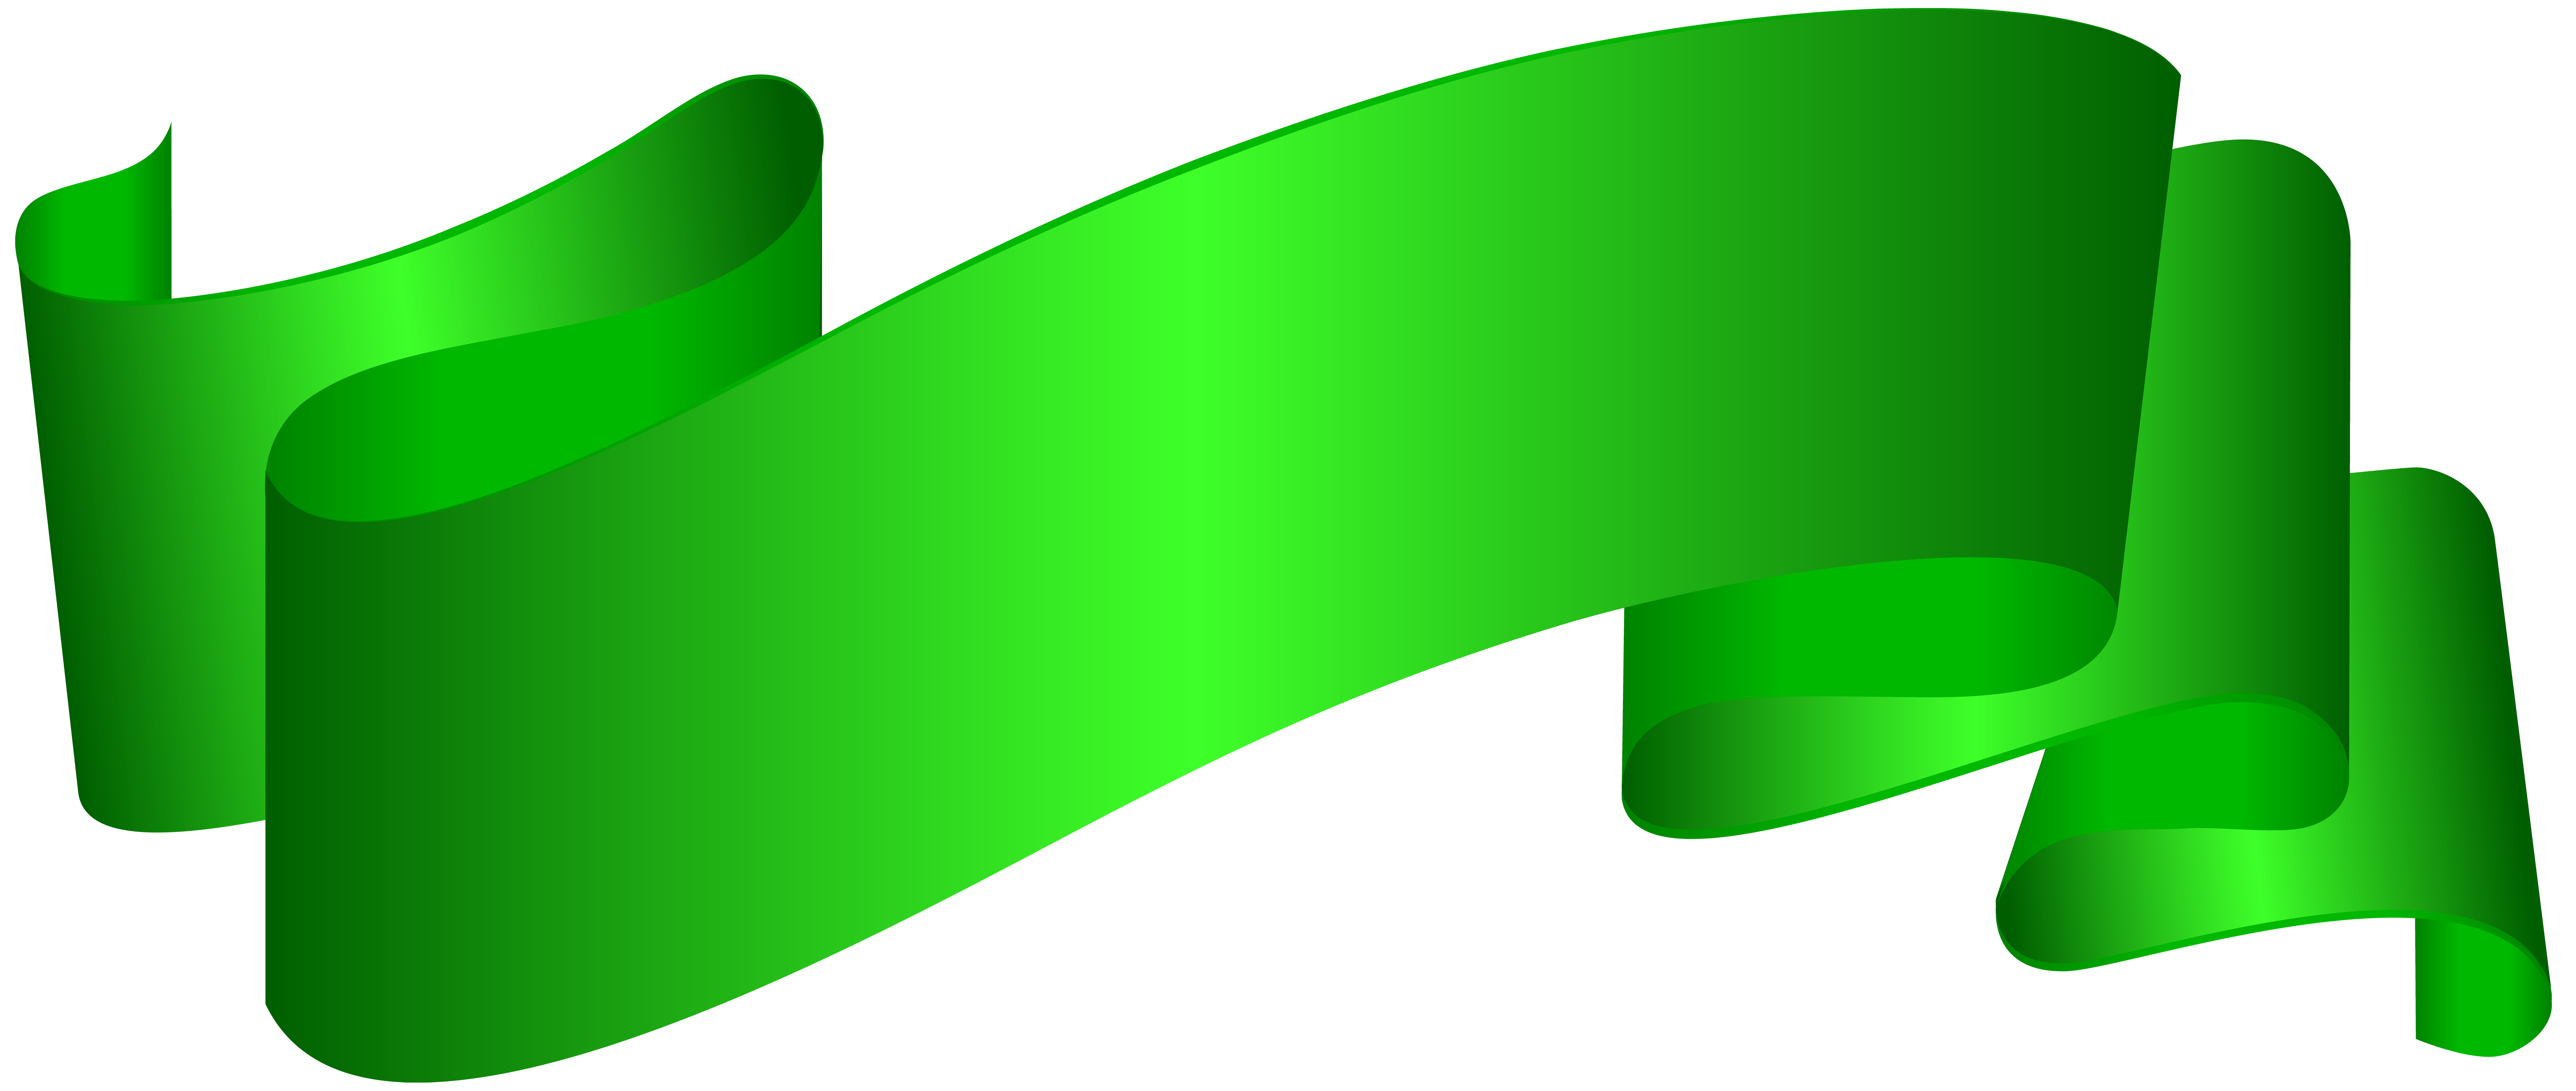 8000x3387 Banner Green Deco Clip Art Png Imageu200b Gallery Yopriceville